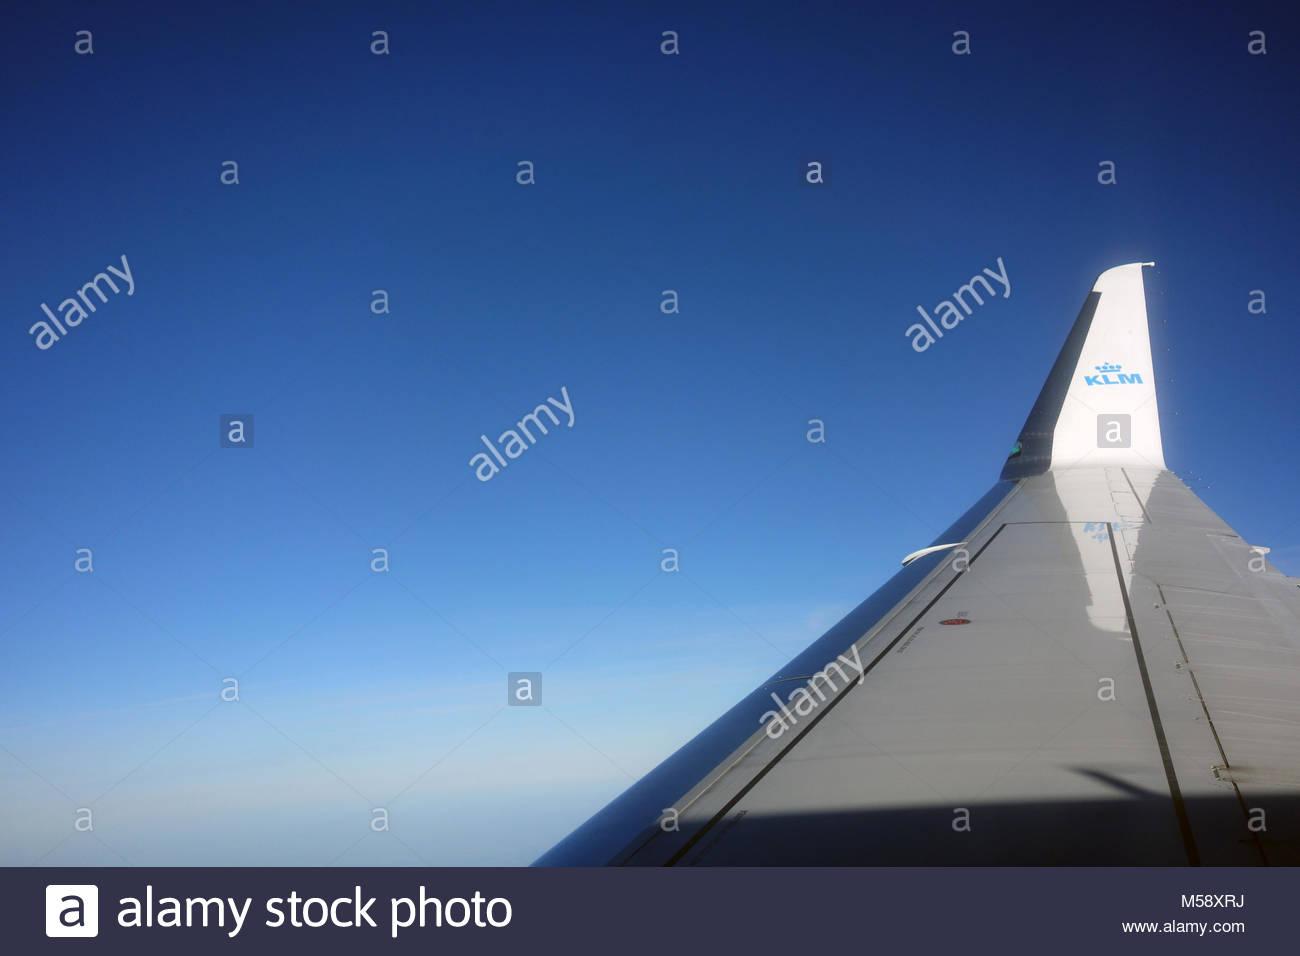 KLM Cityhopper Embraer ERJ-175STD winglet. - Stock Image